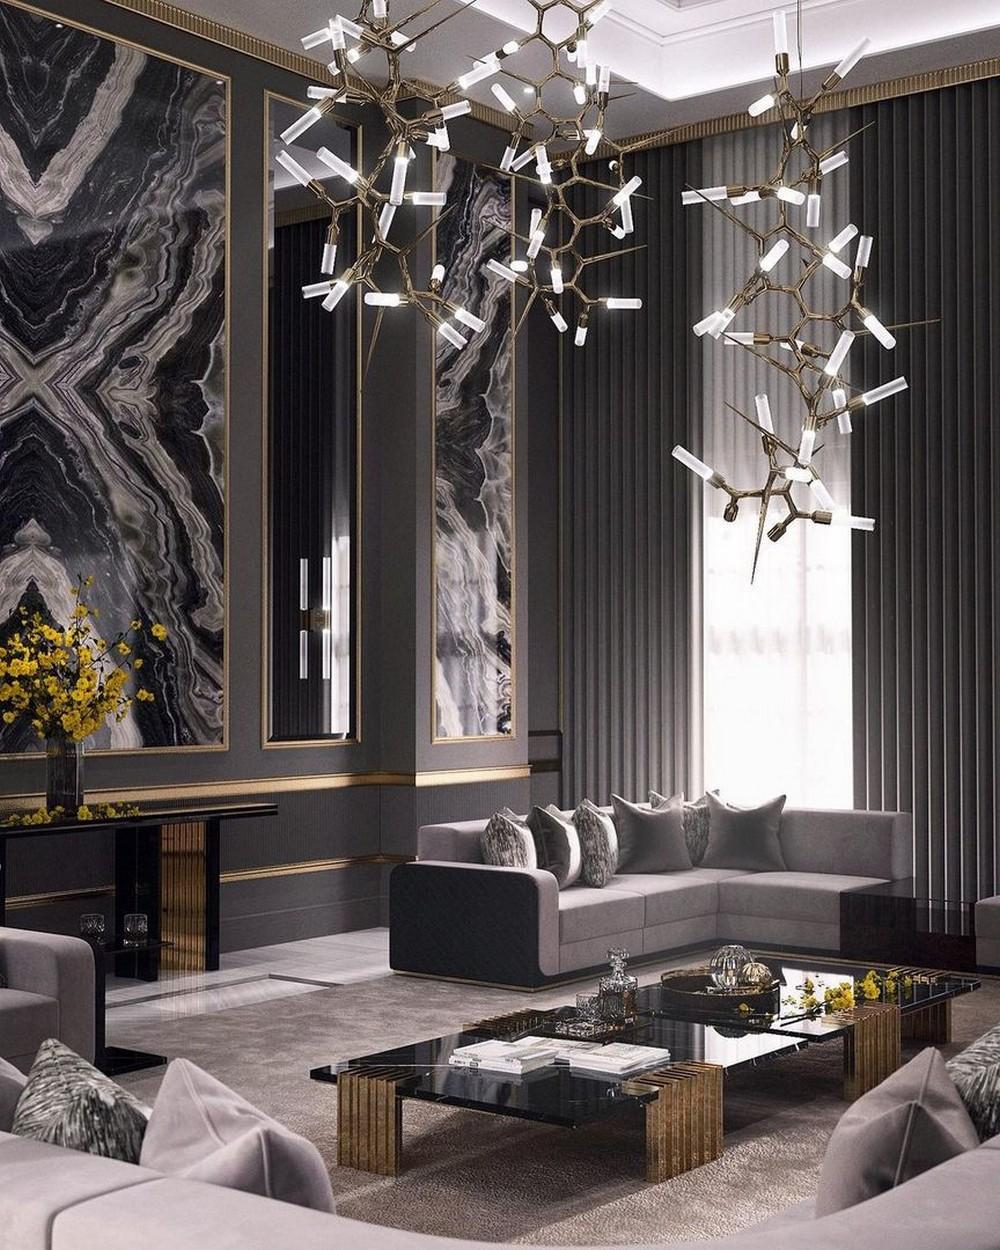 Sala de estar lujuosa: Inspiraciónes con un Diseño de Interior moderno